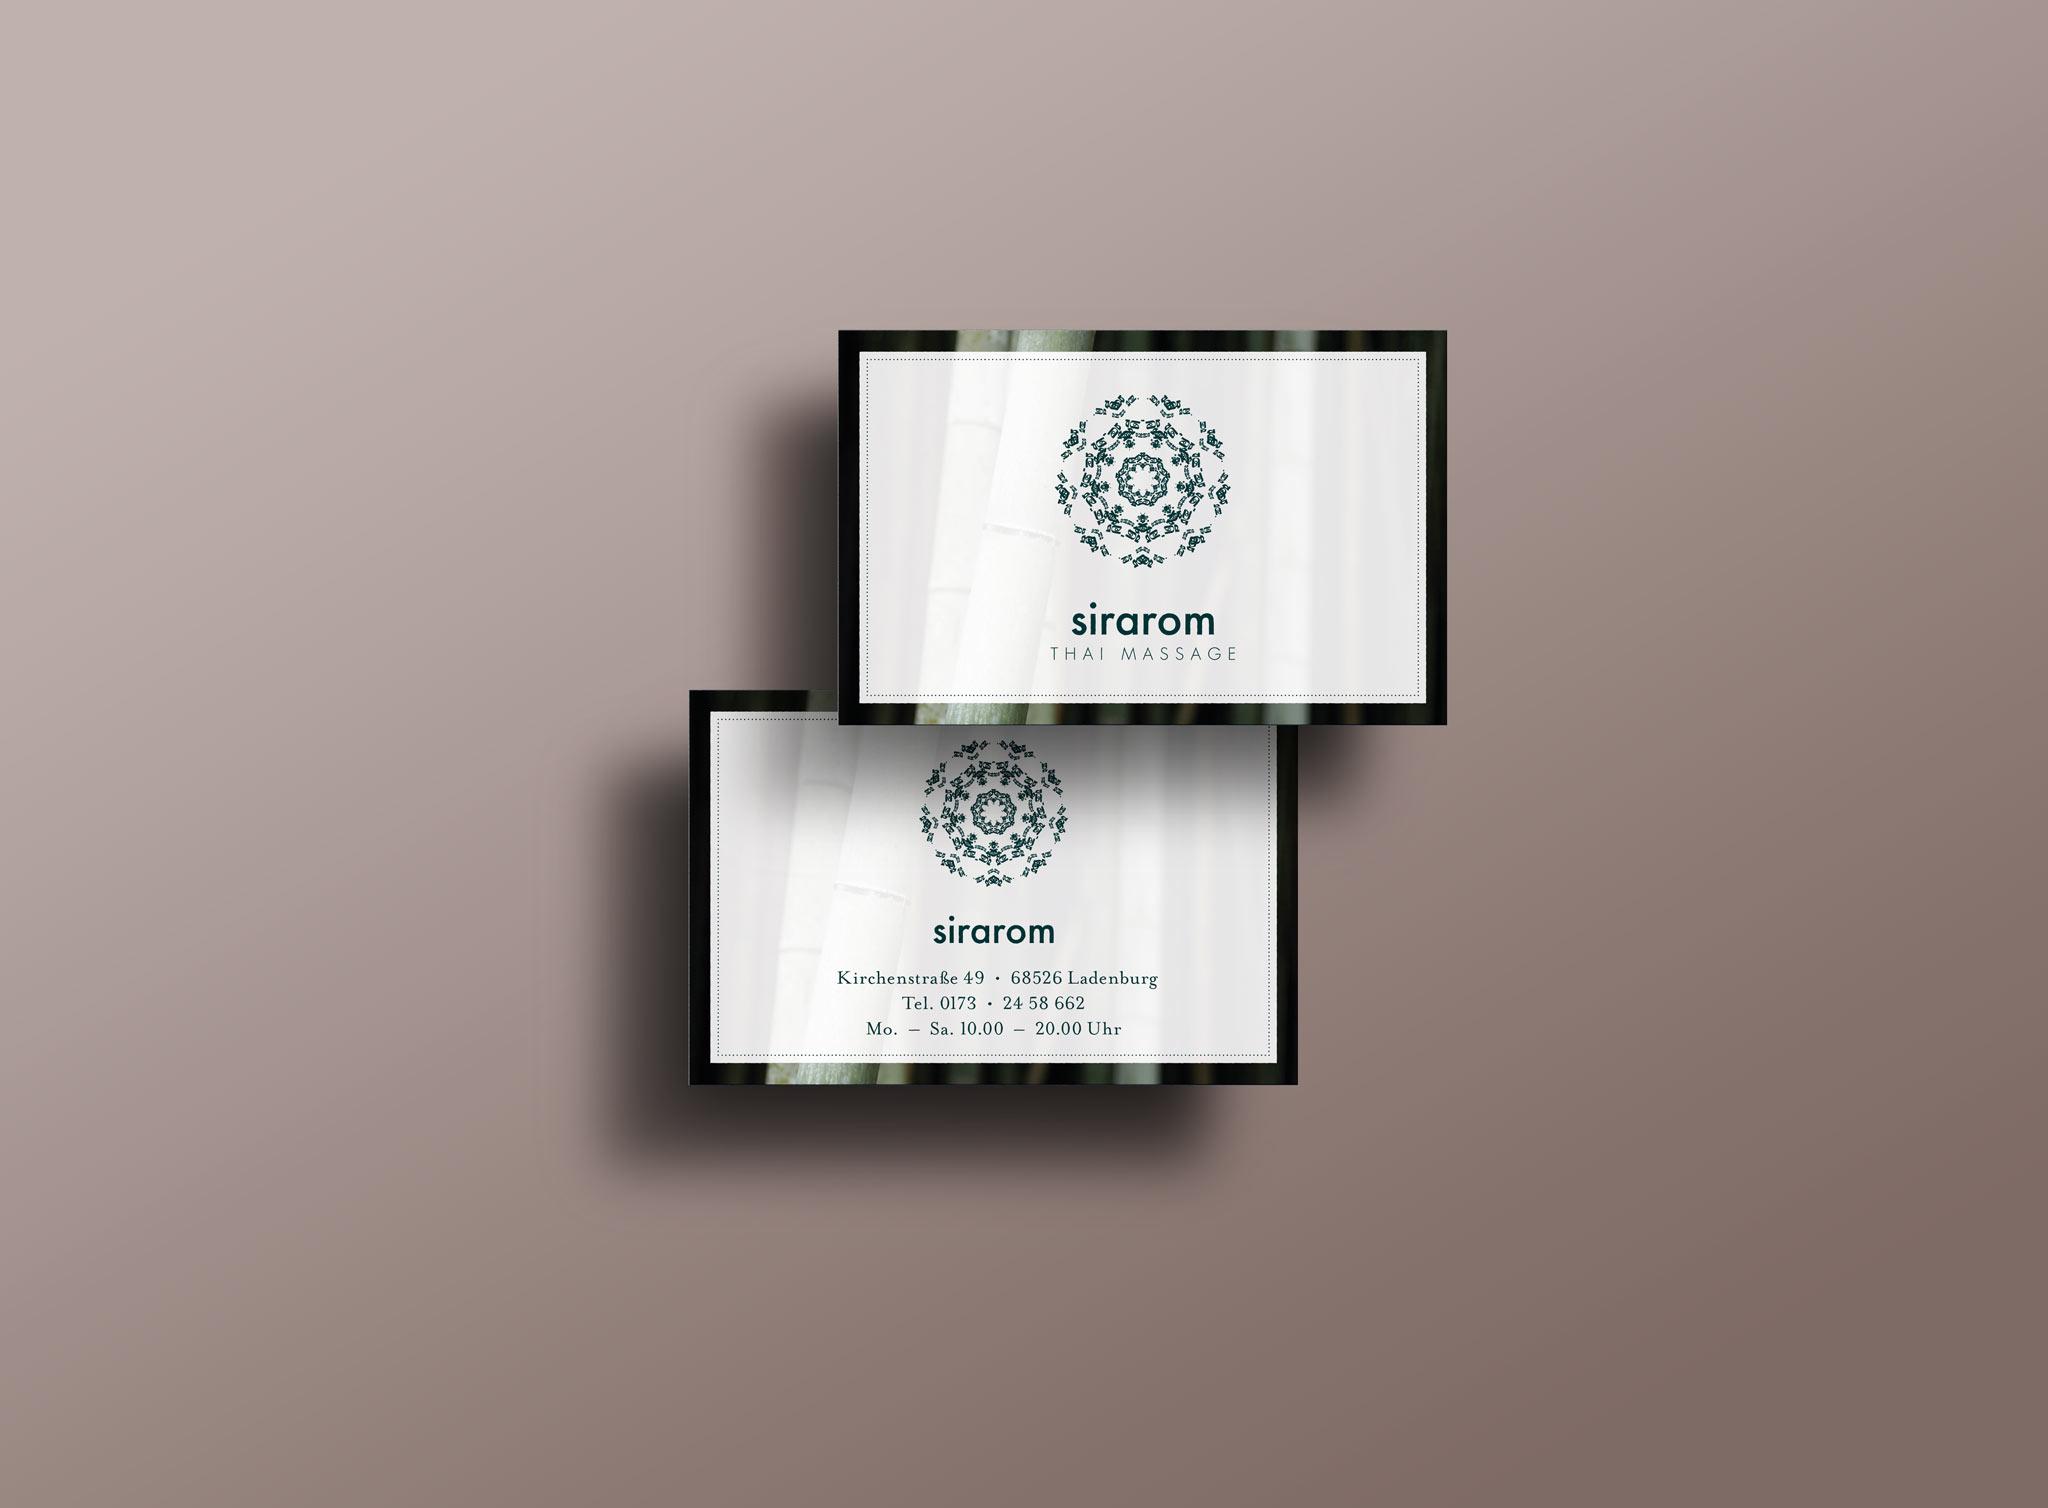 sirarom Thai Massage Visitenkarte Geschäftsausstattung Corporate Design Gesa Siebert Kommunikationsdesign